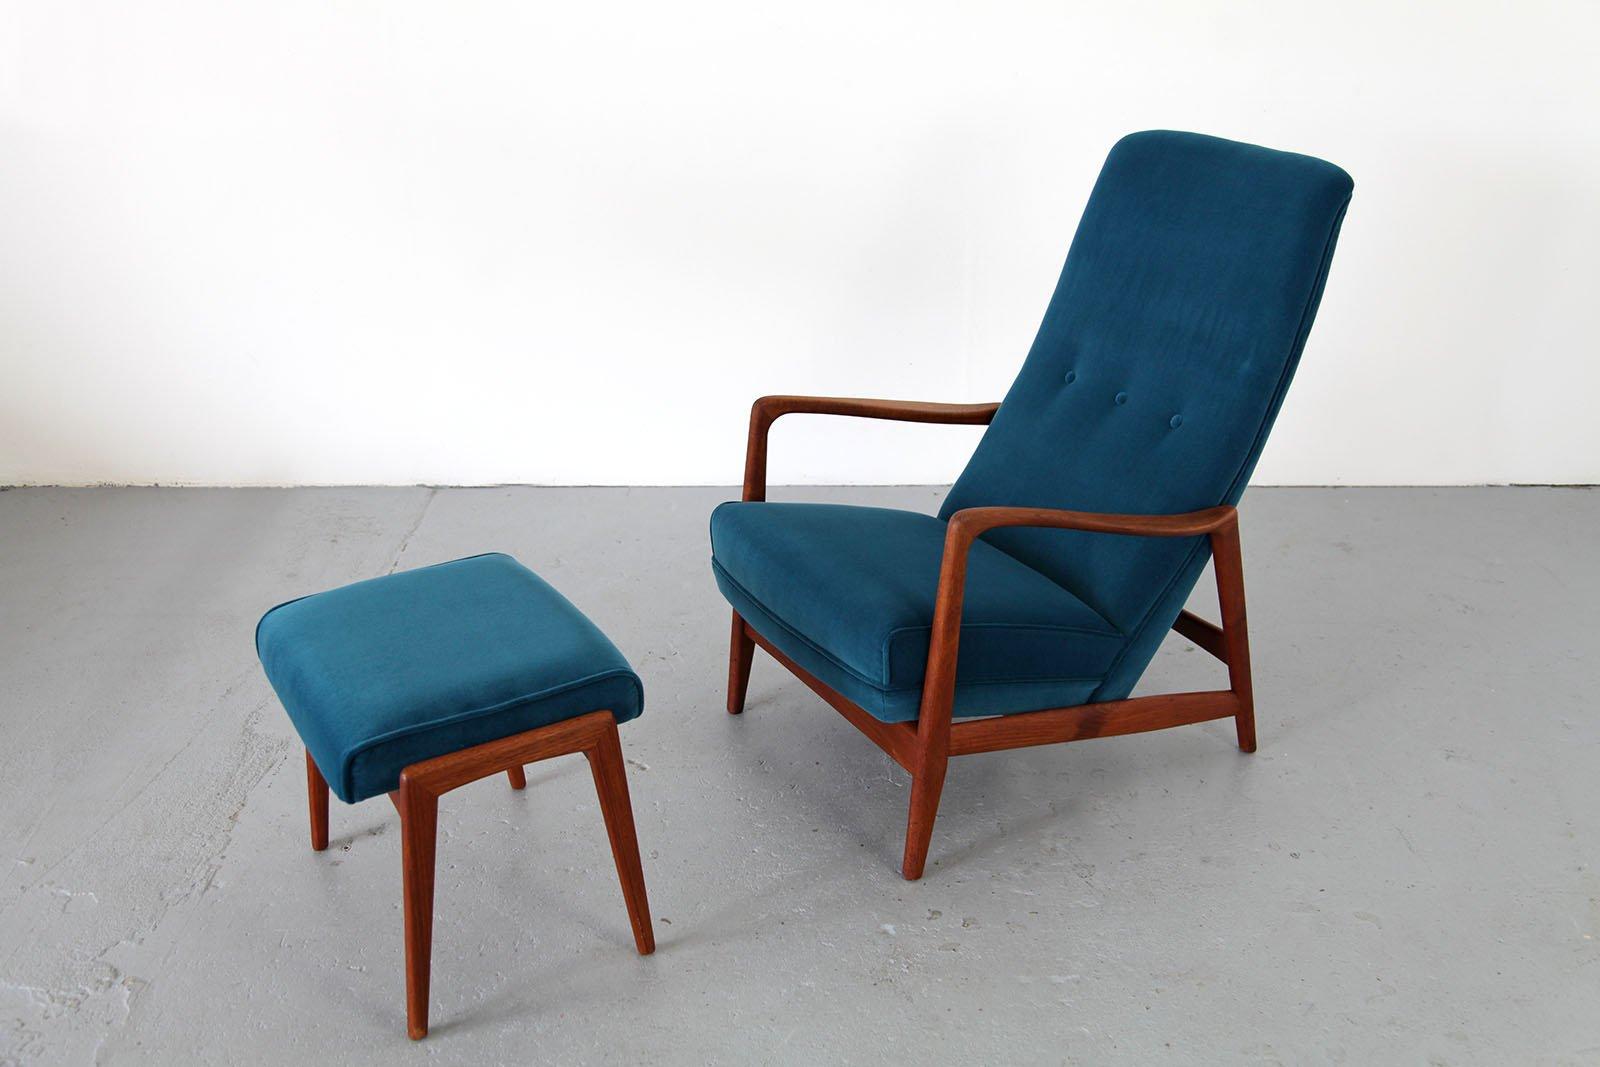 mid century sessel mit fu hocker von gio ponti f r cassina bei pamono kaufen. Black Bedroom Furniture Sets. Home Design Ideas